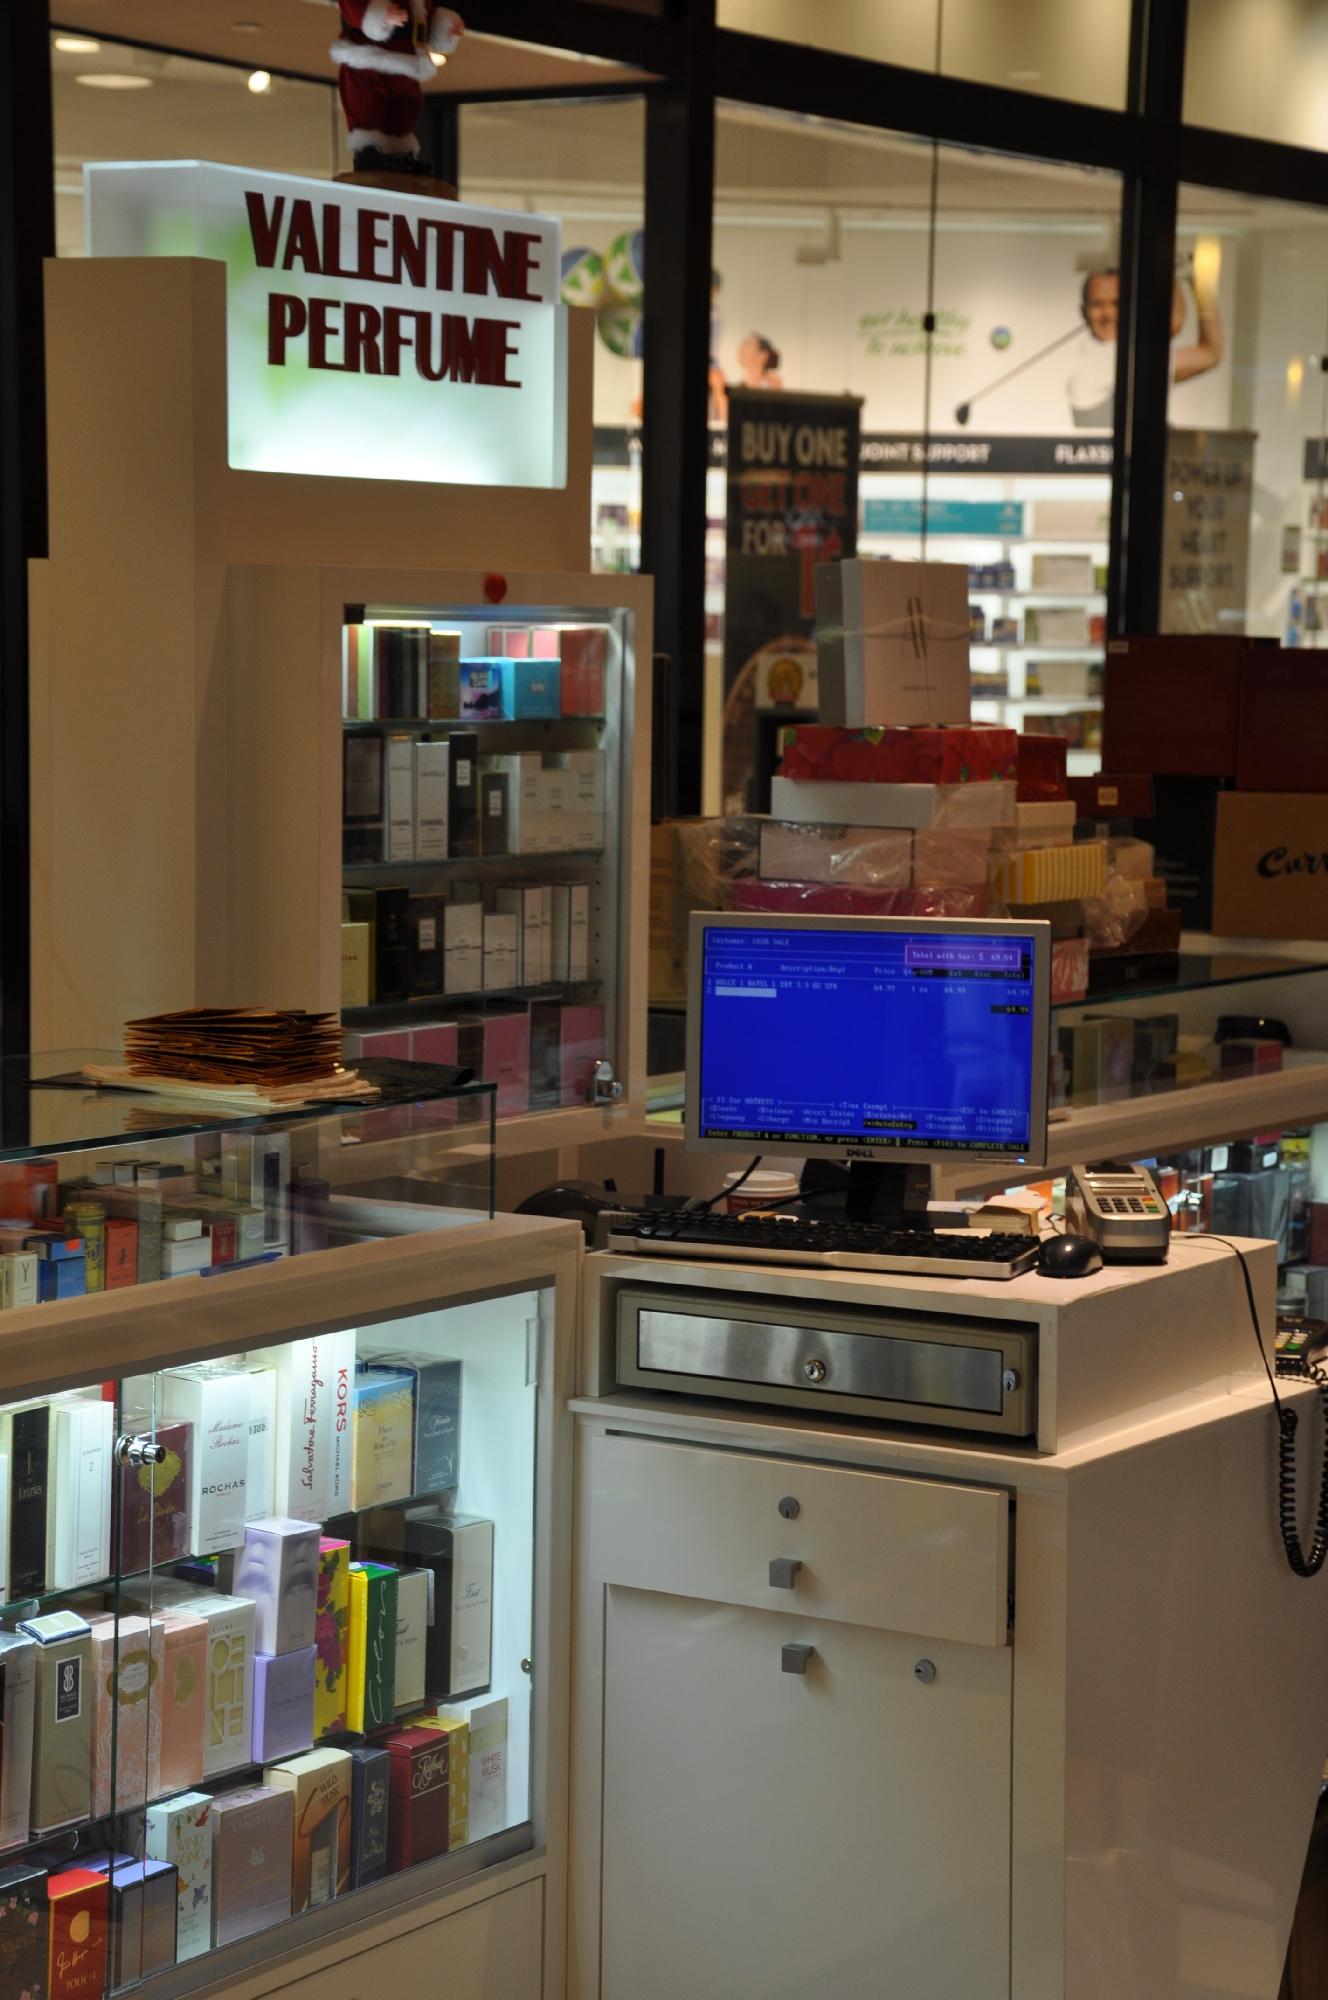 Valentine Perfume Kiosk BWC - Resize _14.jpg